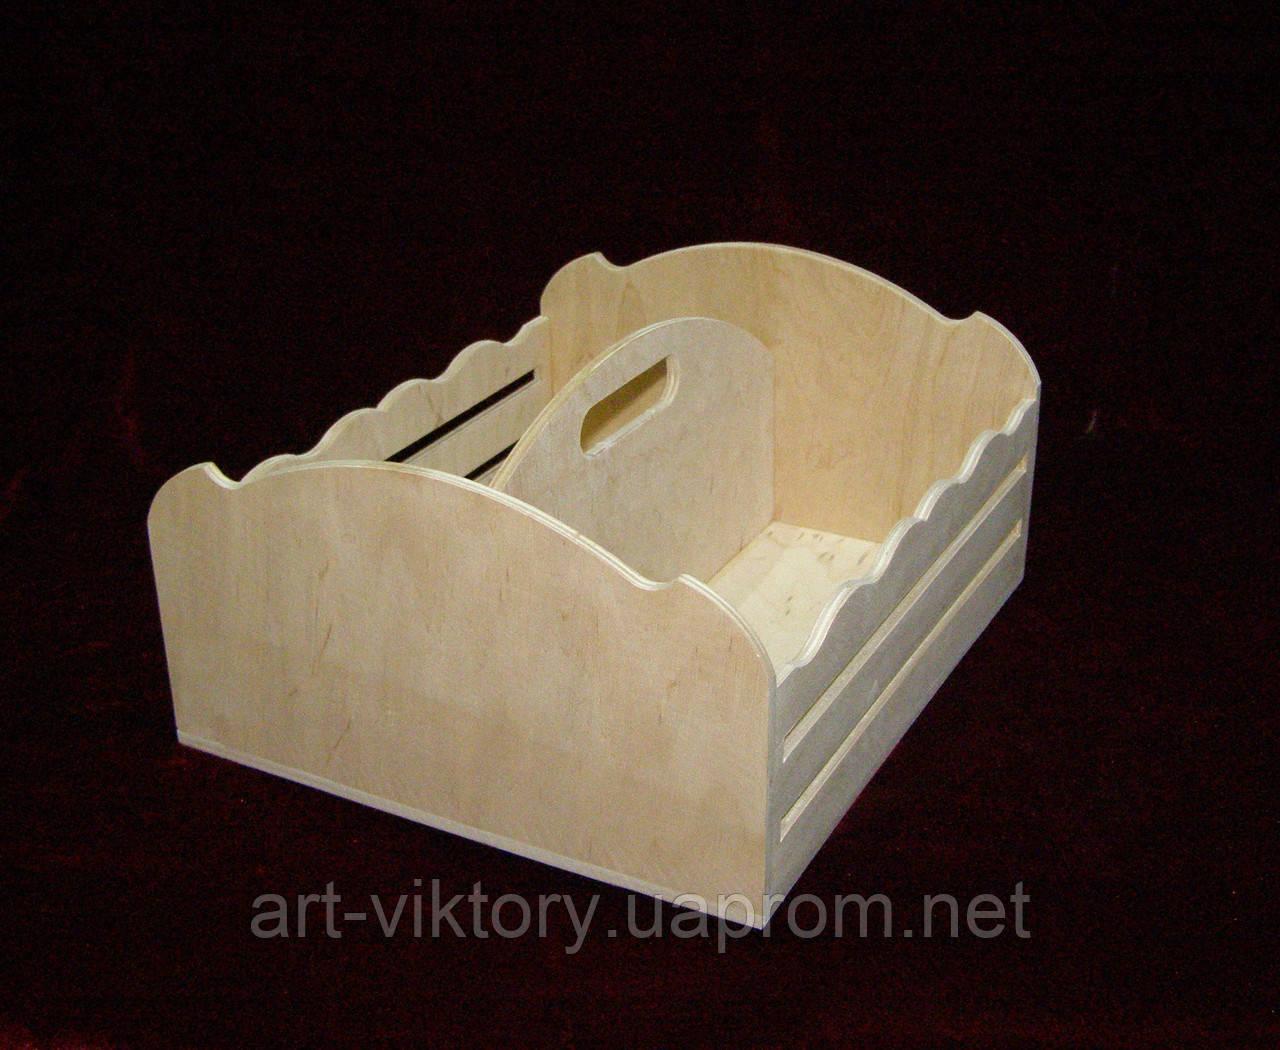 Короб с отсеками, спецовница (27,5 х 24 х 13,5 см)